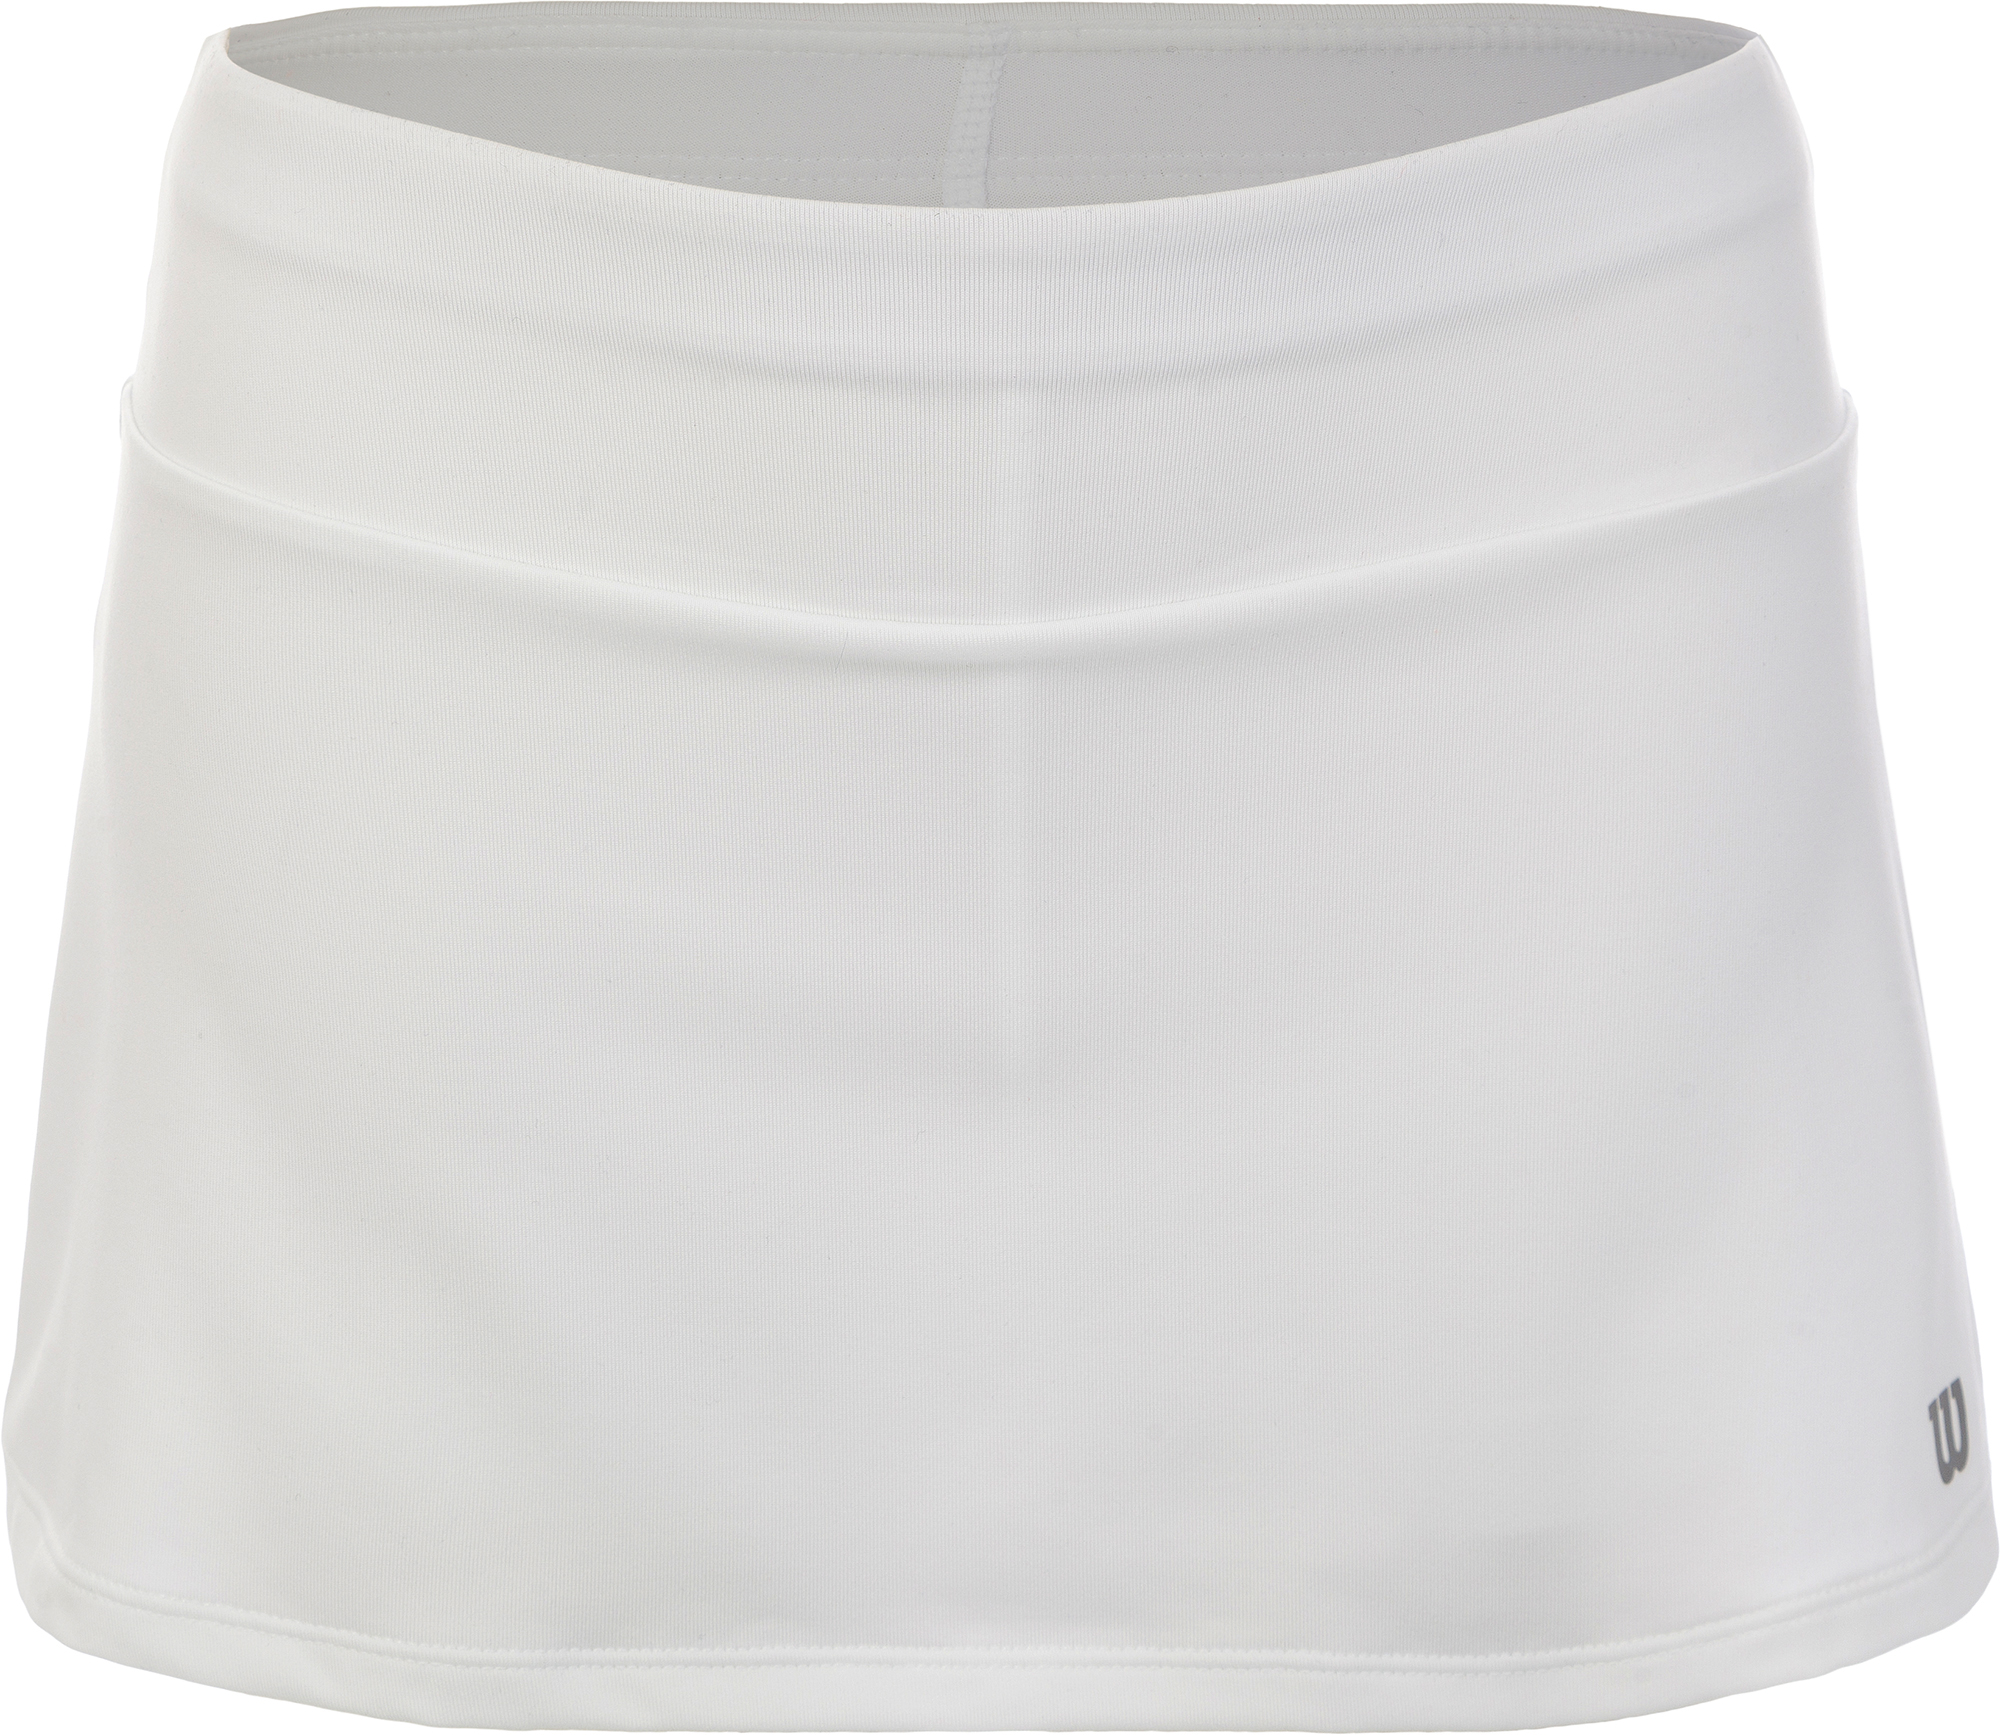 Wilson Юбка для девочек Wilson Core 11, размер 125-133 юбки апрель юбка иностранка